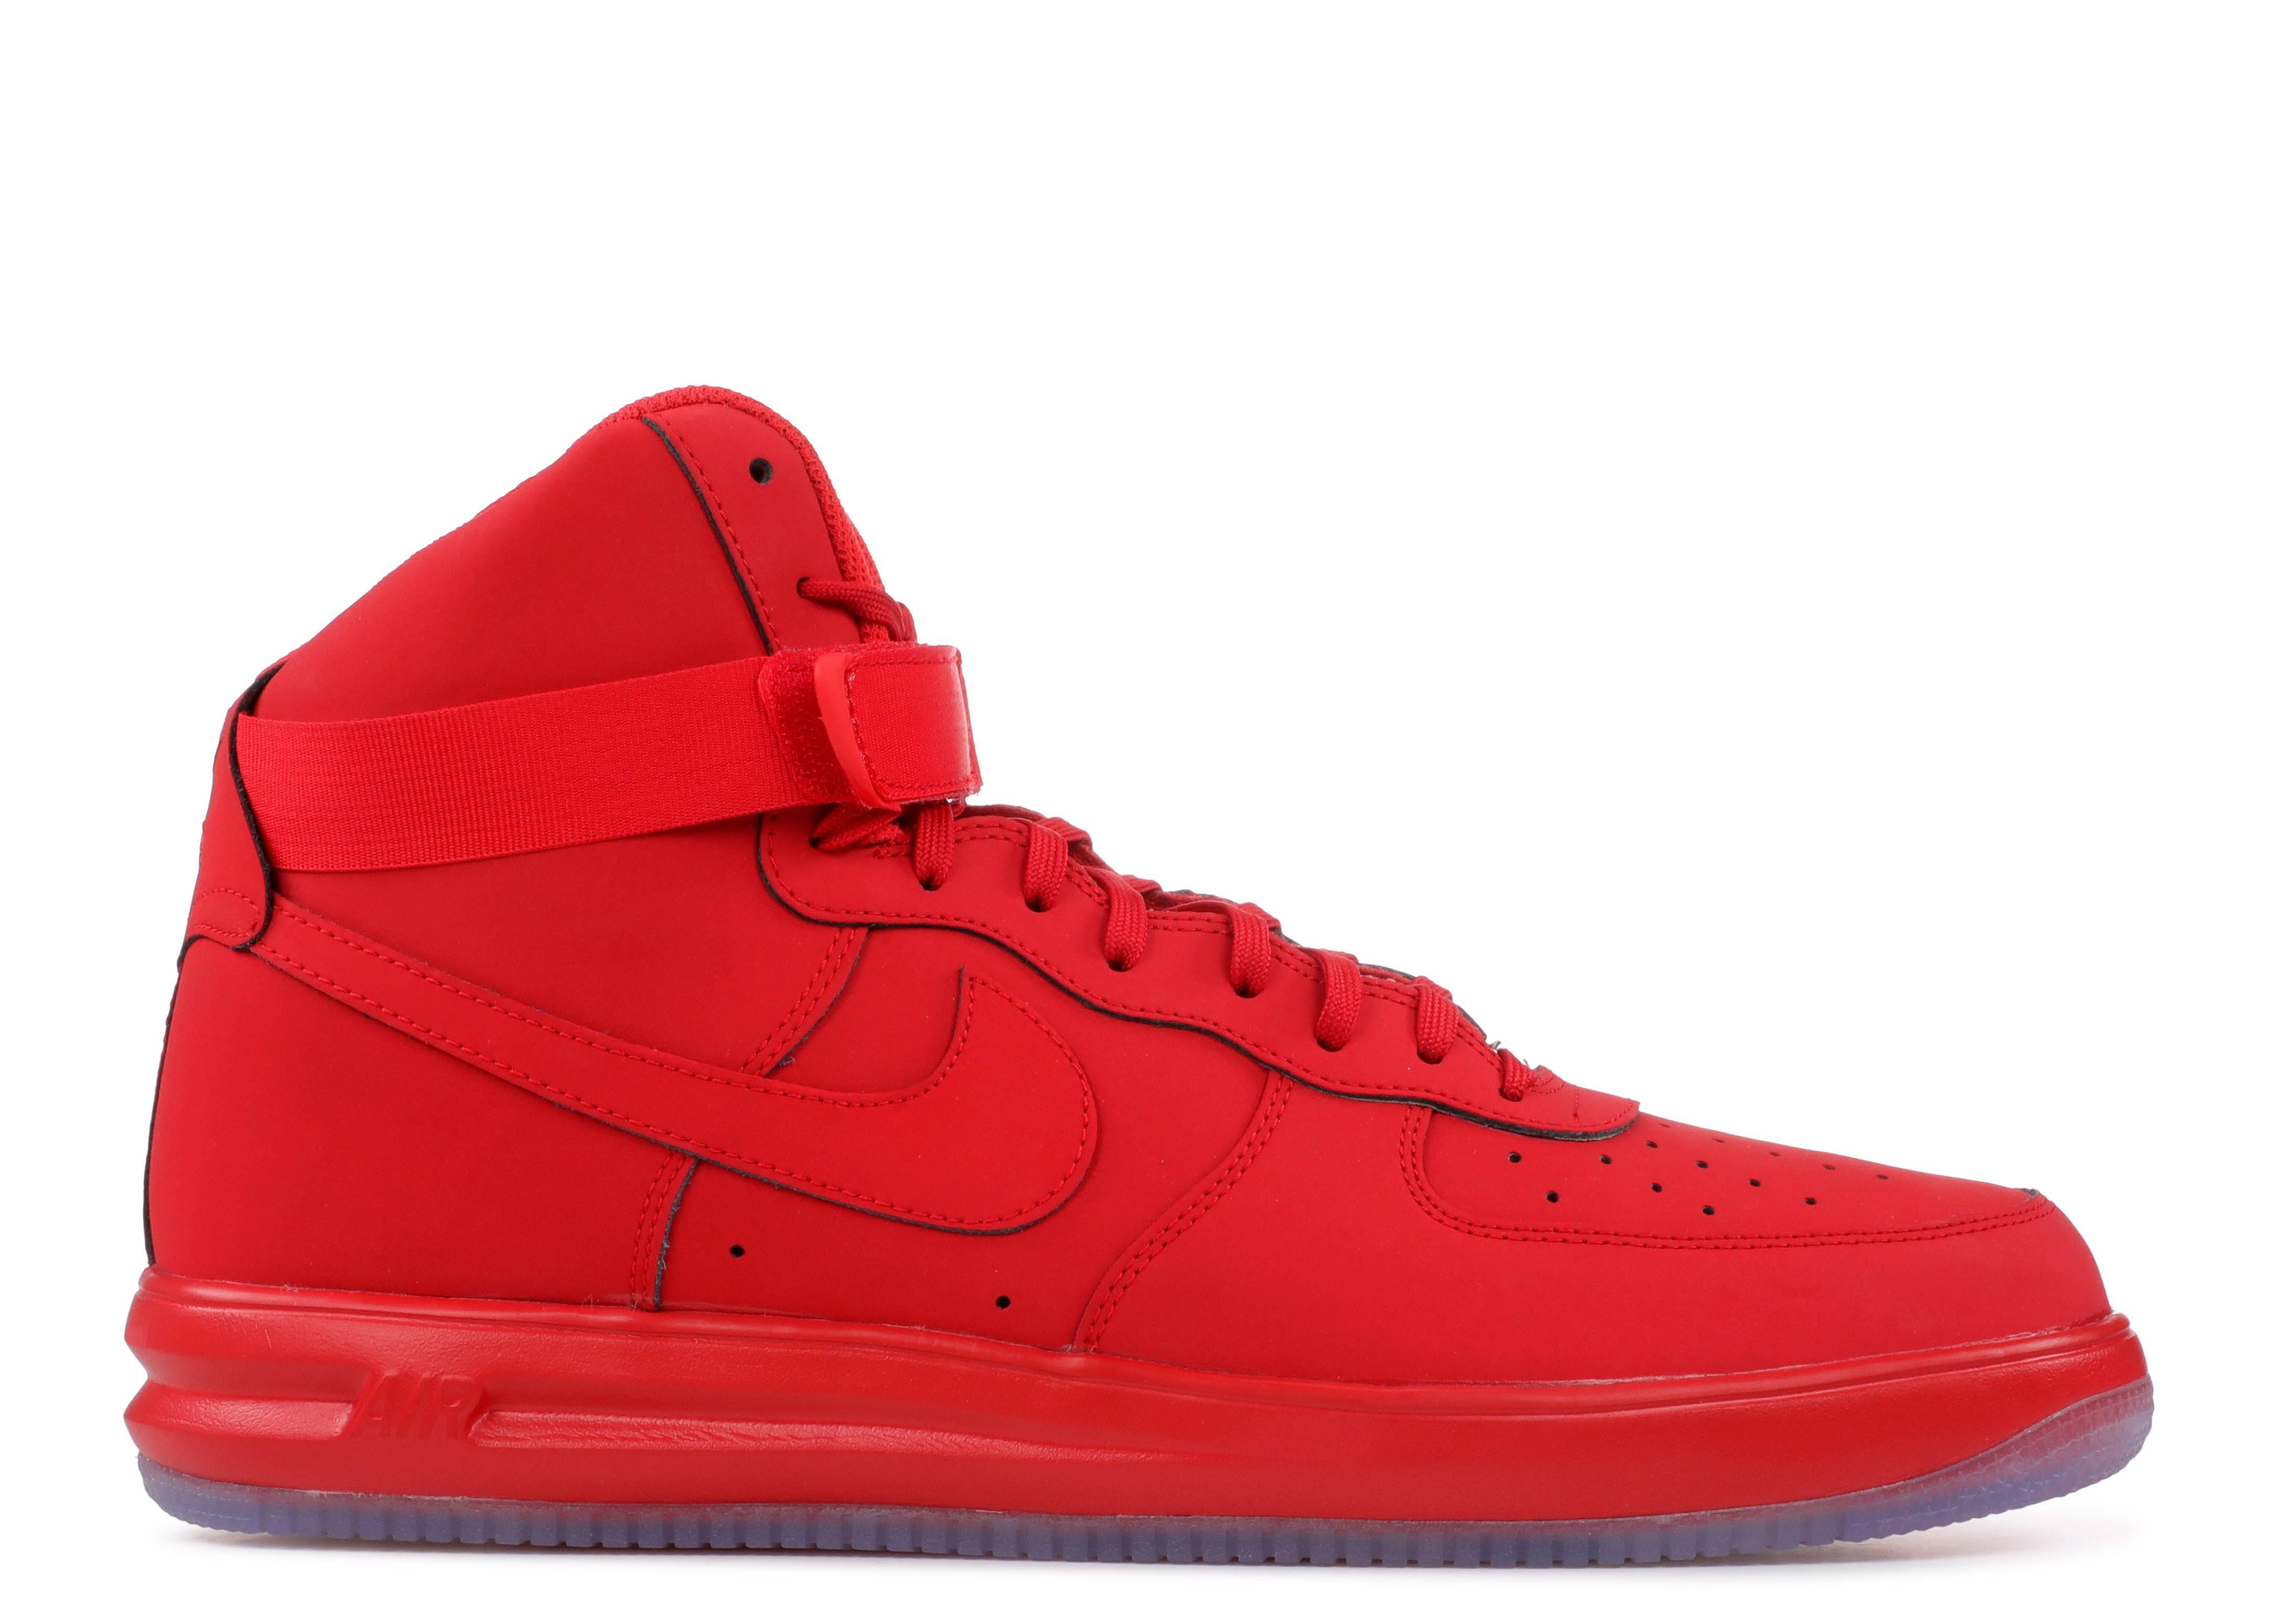 Nike kd 6 elite eybl